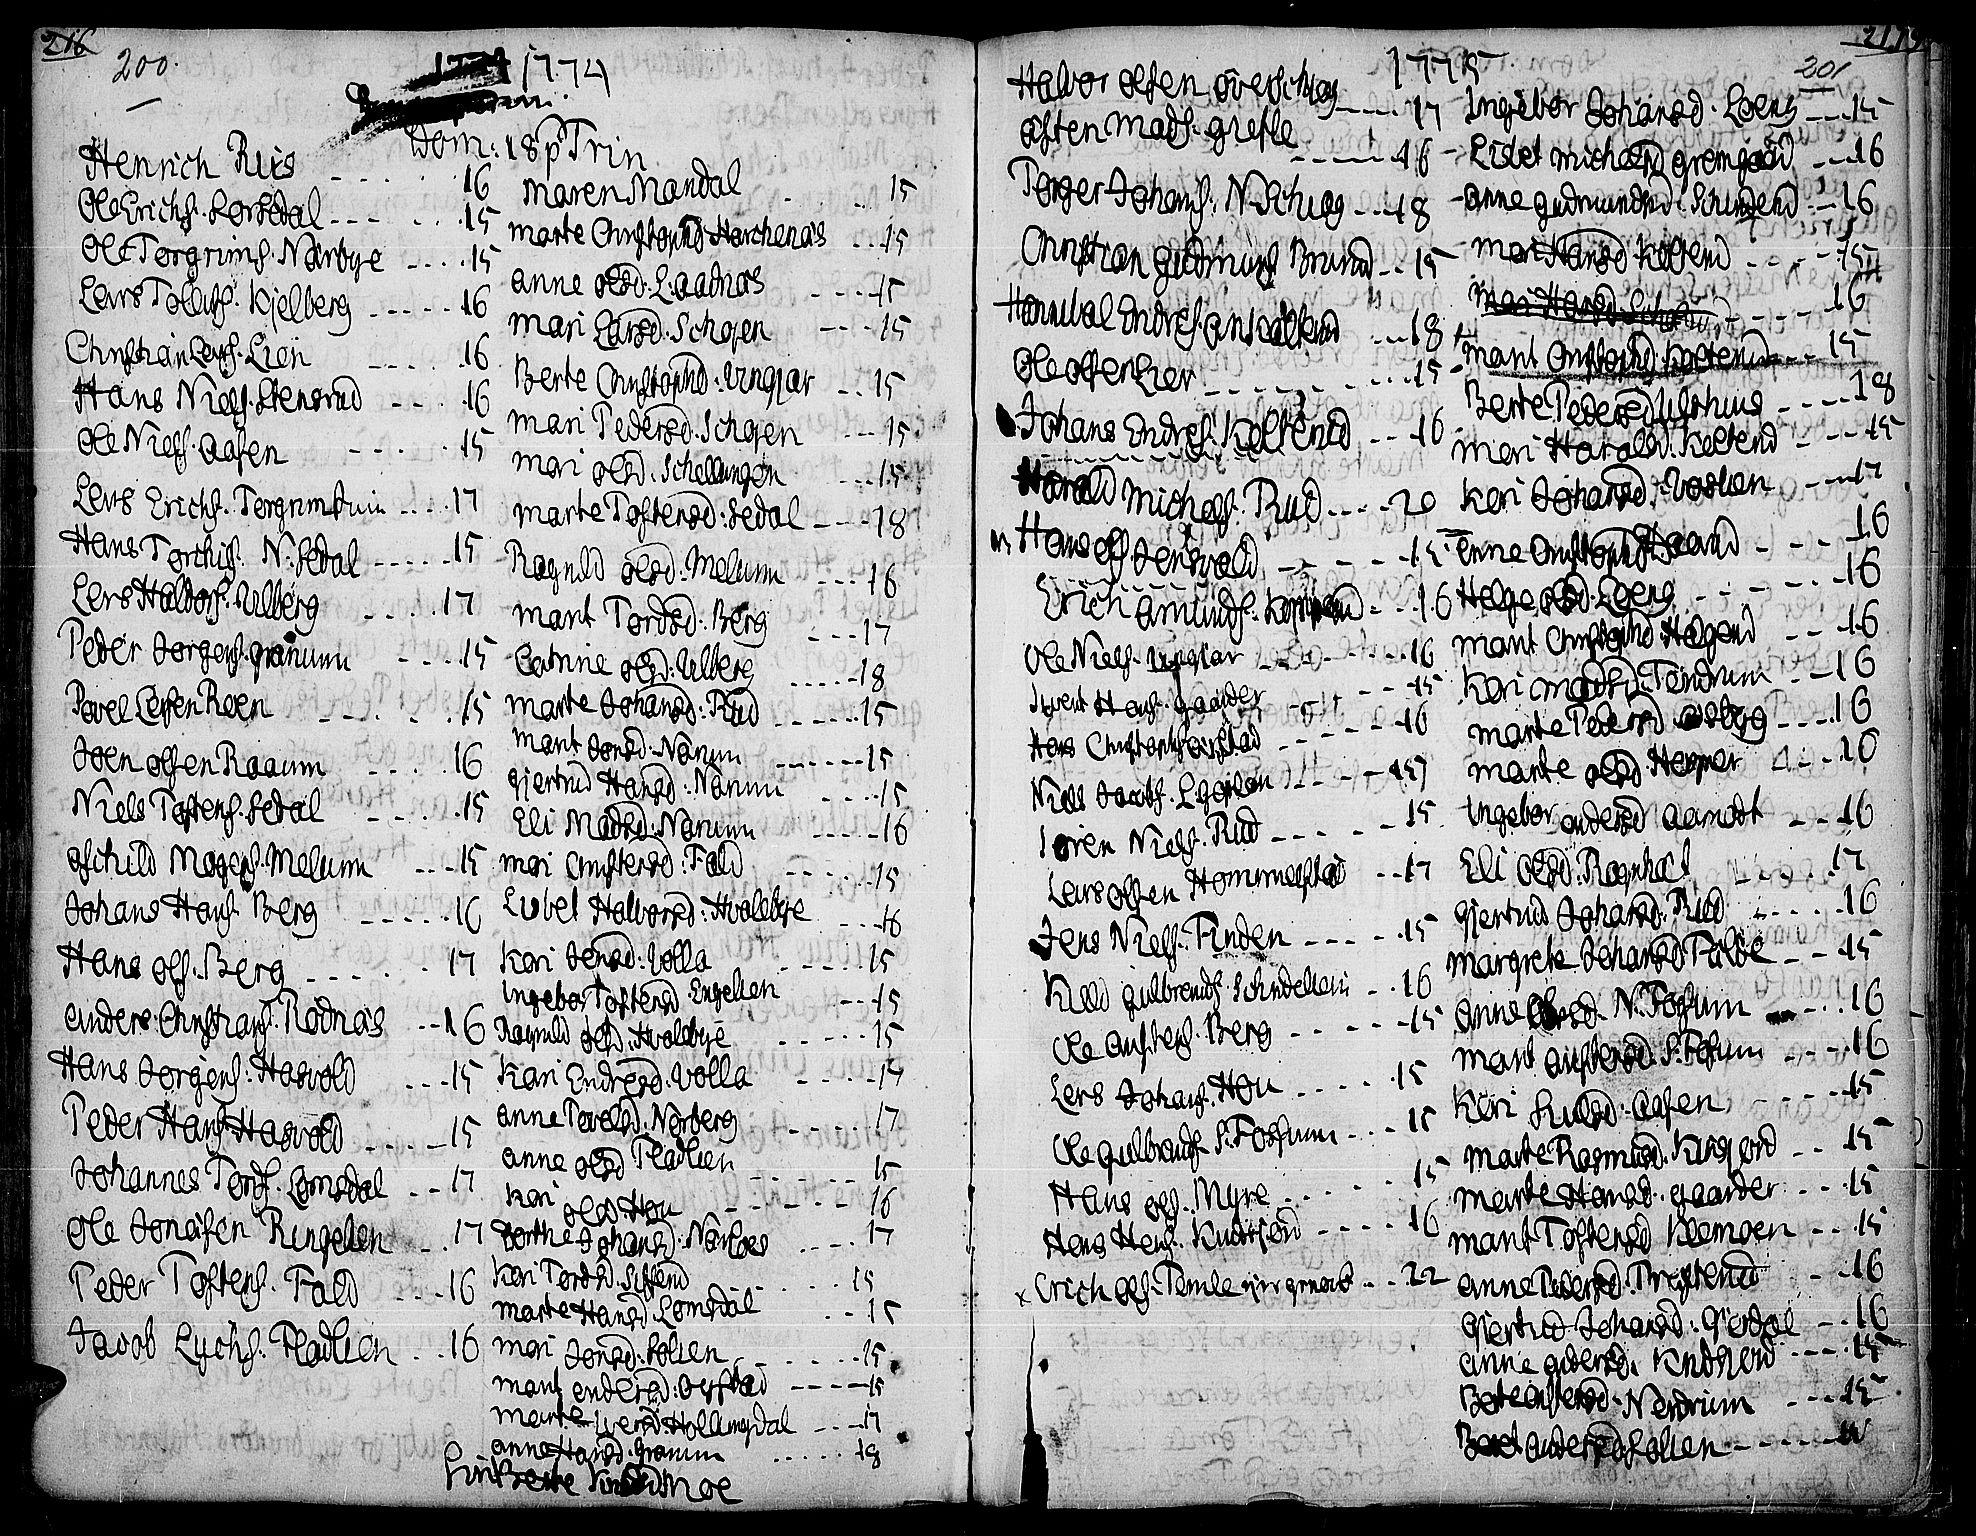 SAH, Land prestekontor, Ministerialbok nr. 5, 1765-1784, s. 200-201